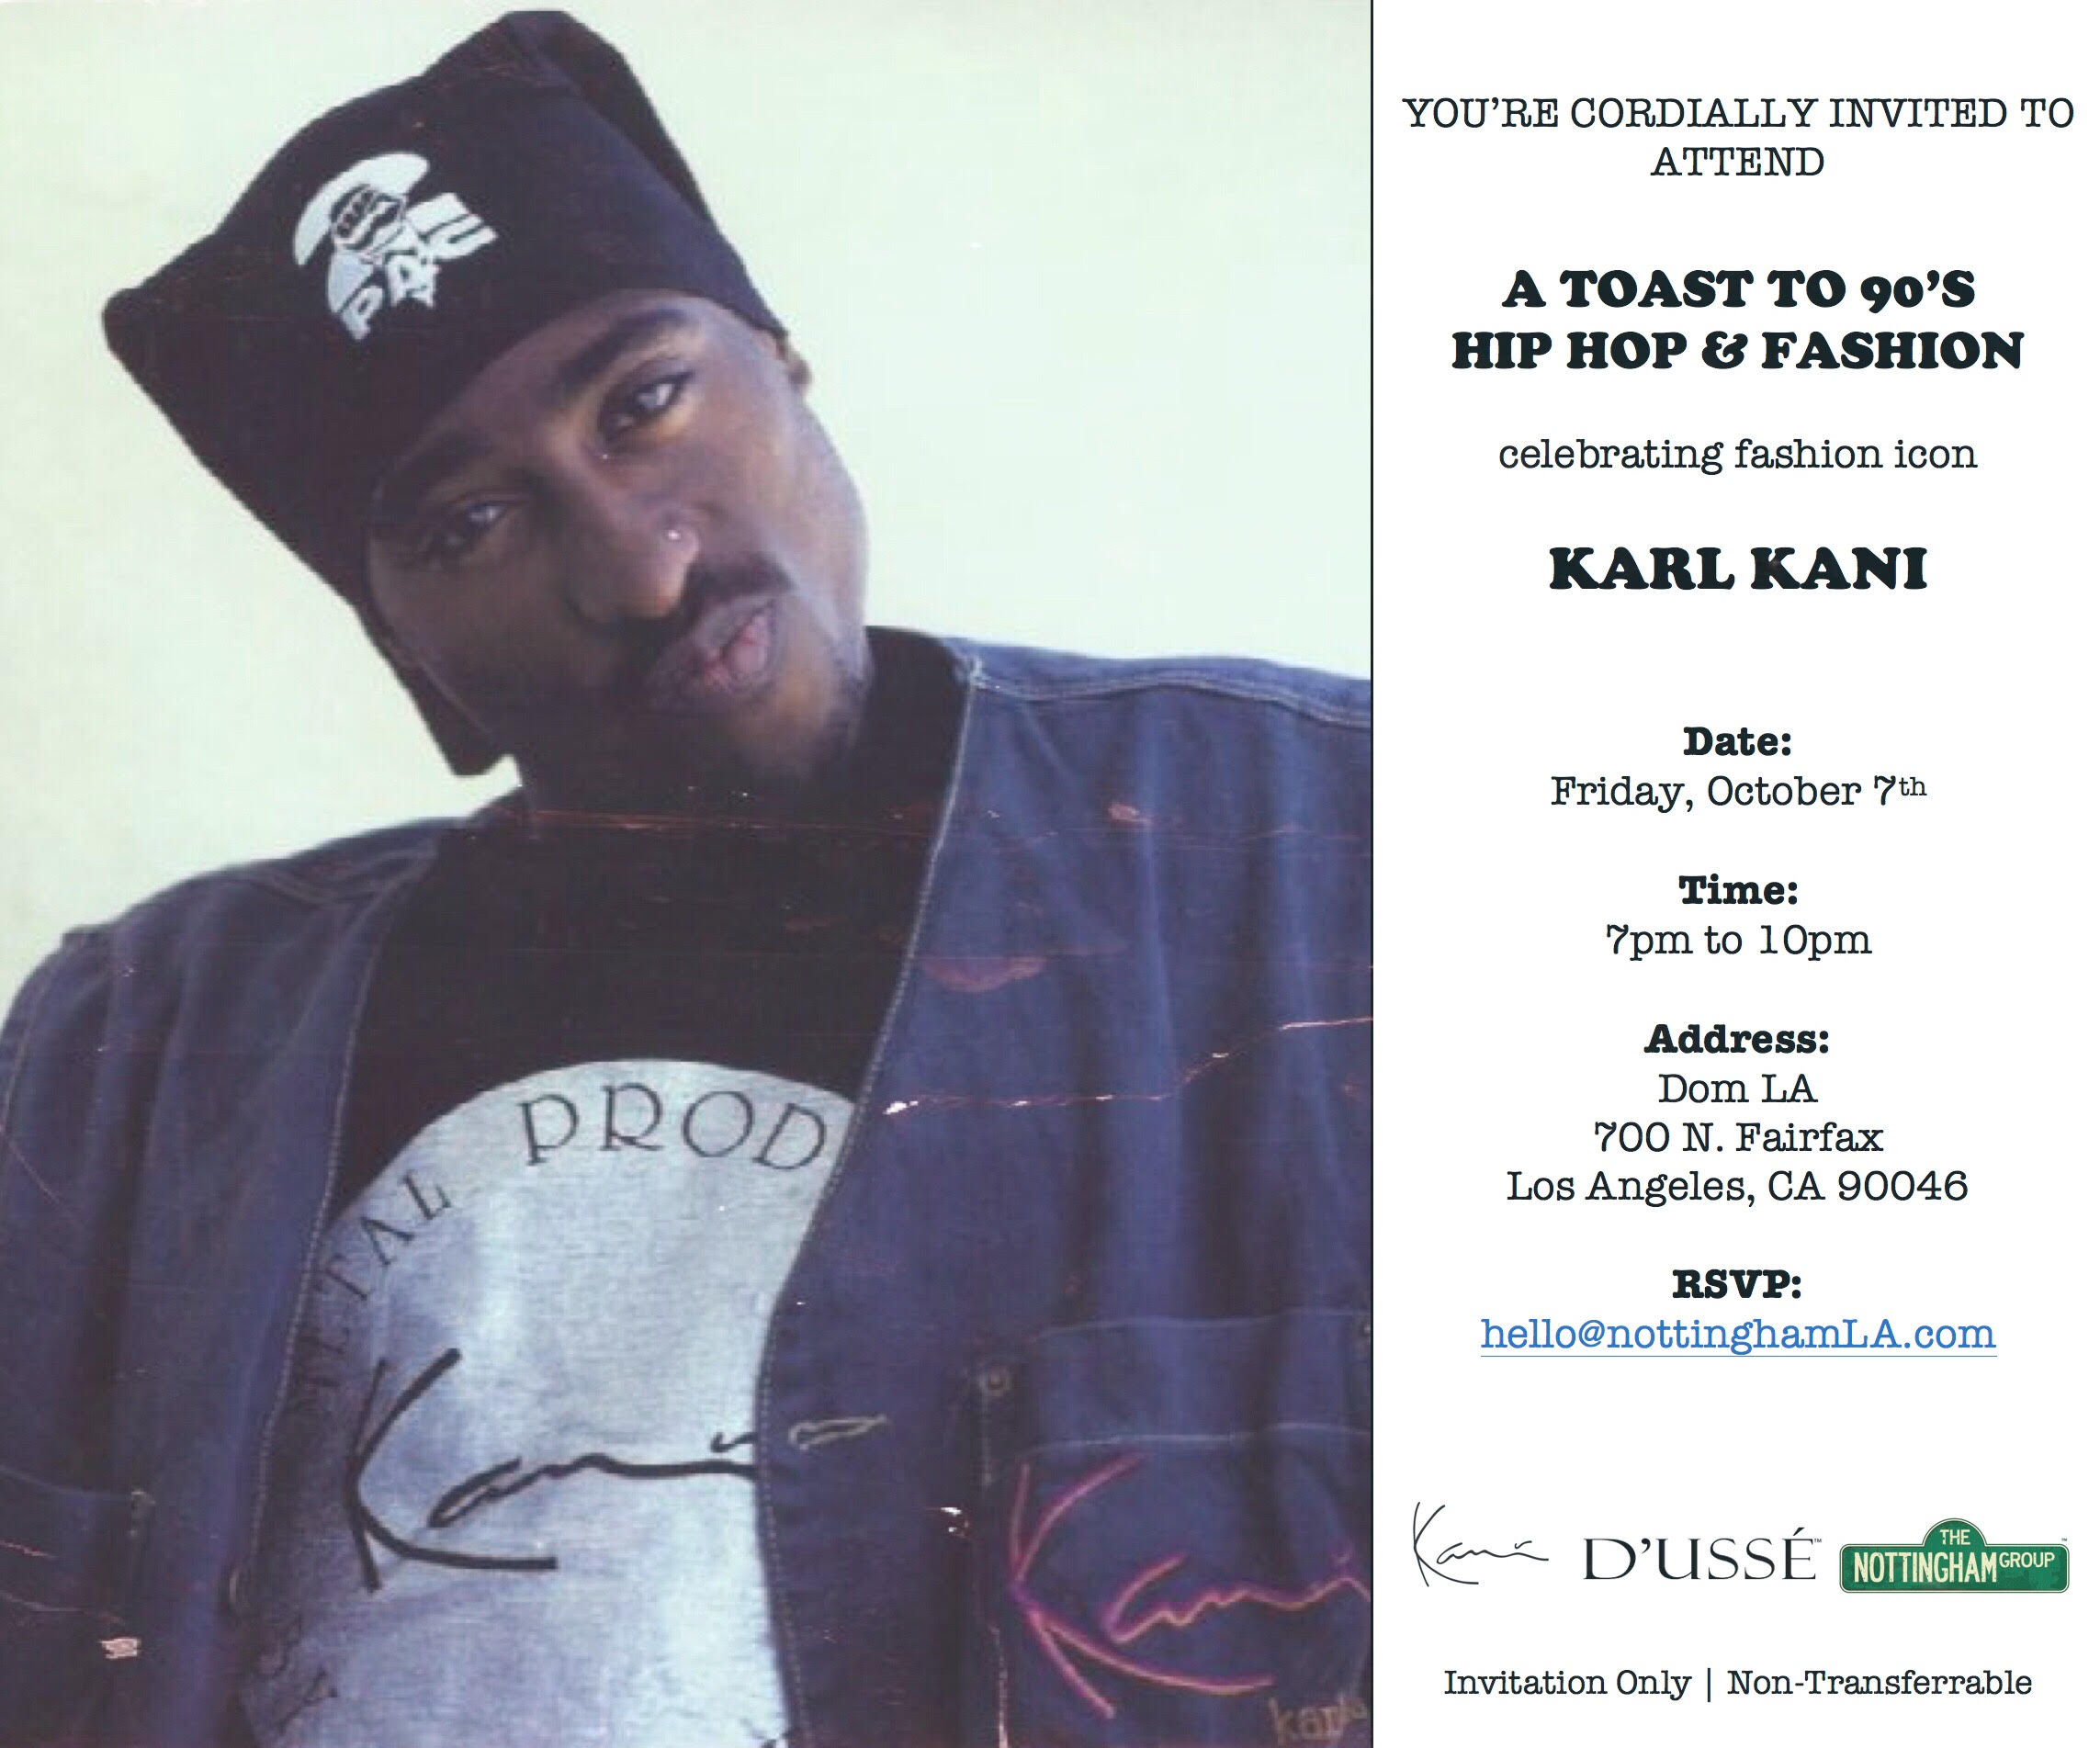 Karl Kani Brings The 90s Back | HipHopDX